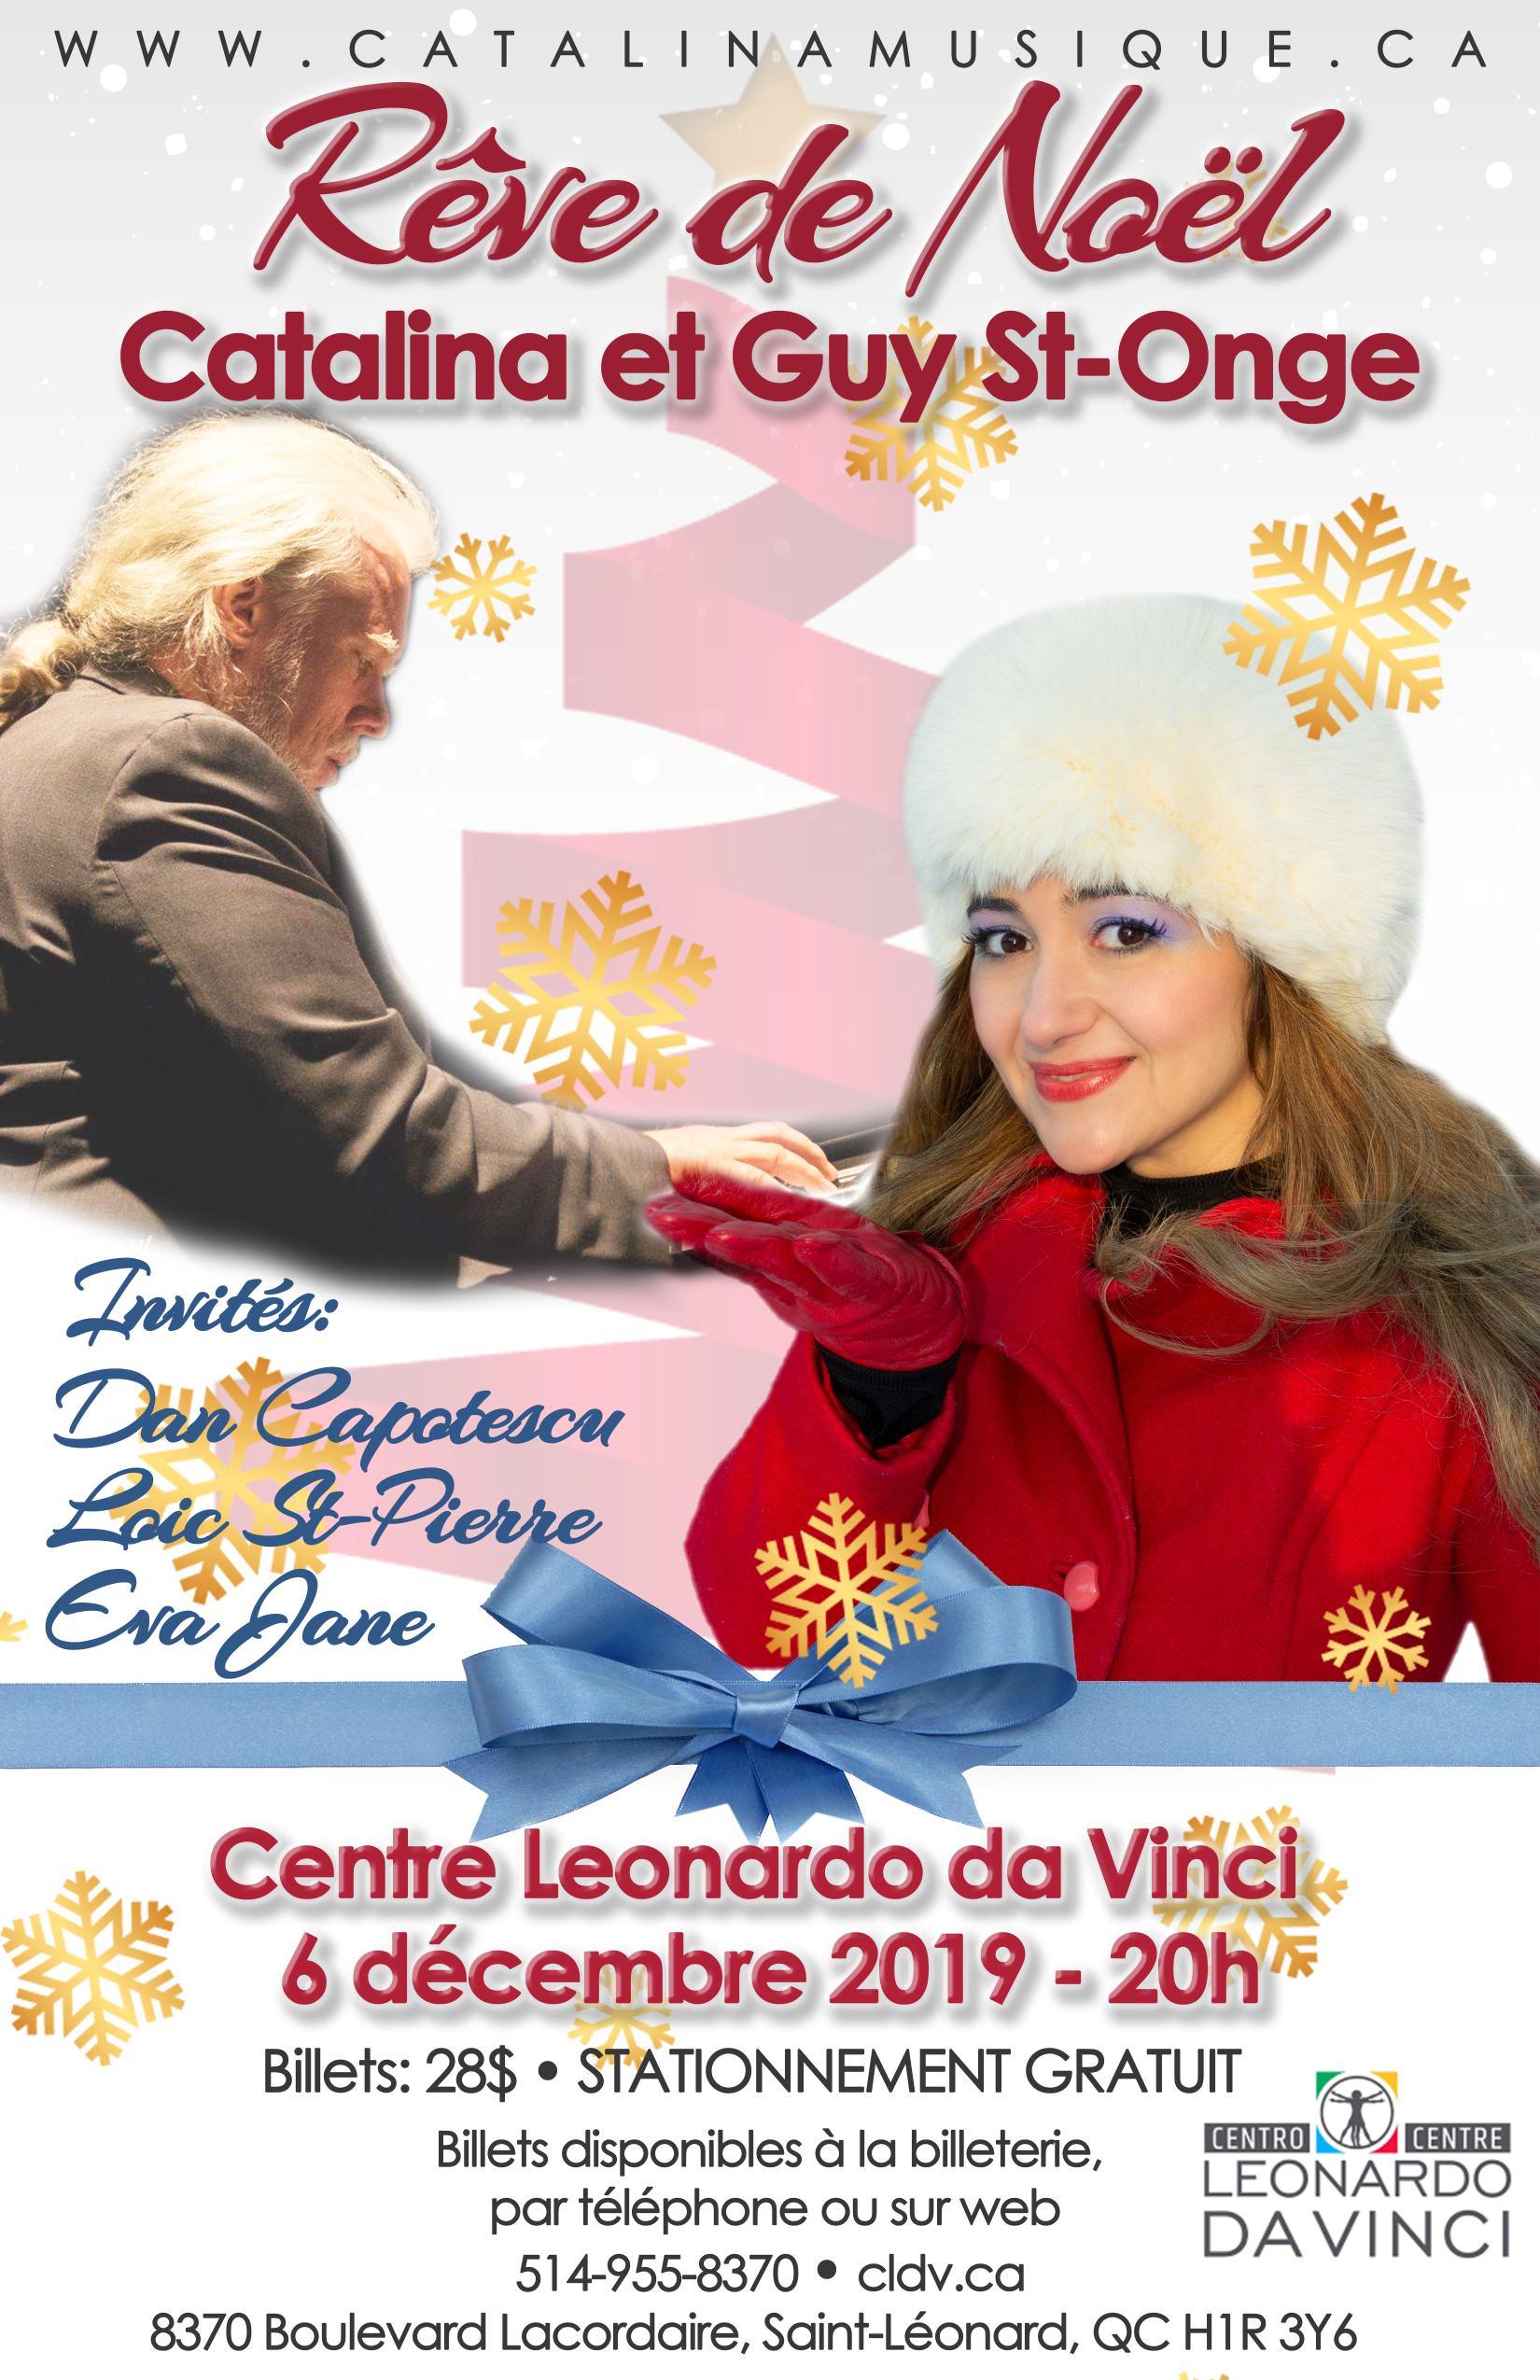 Rêve de Noël - Catalina et Guy St-Onge